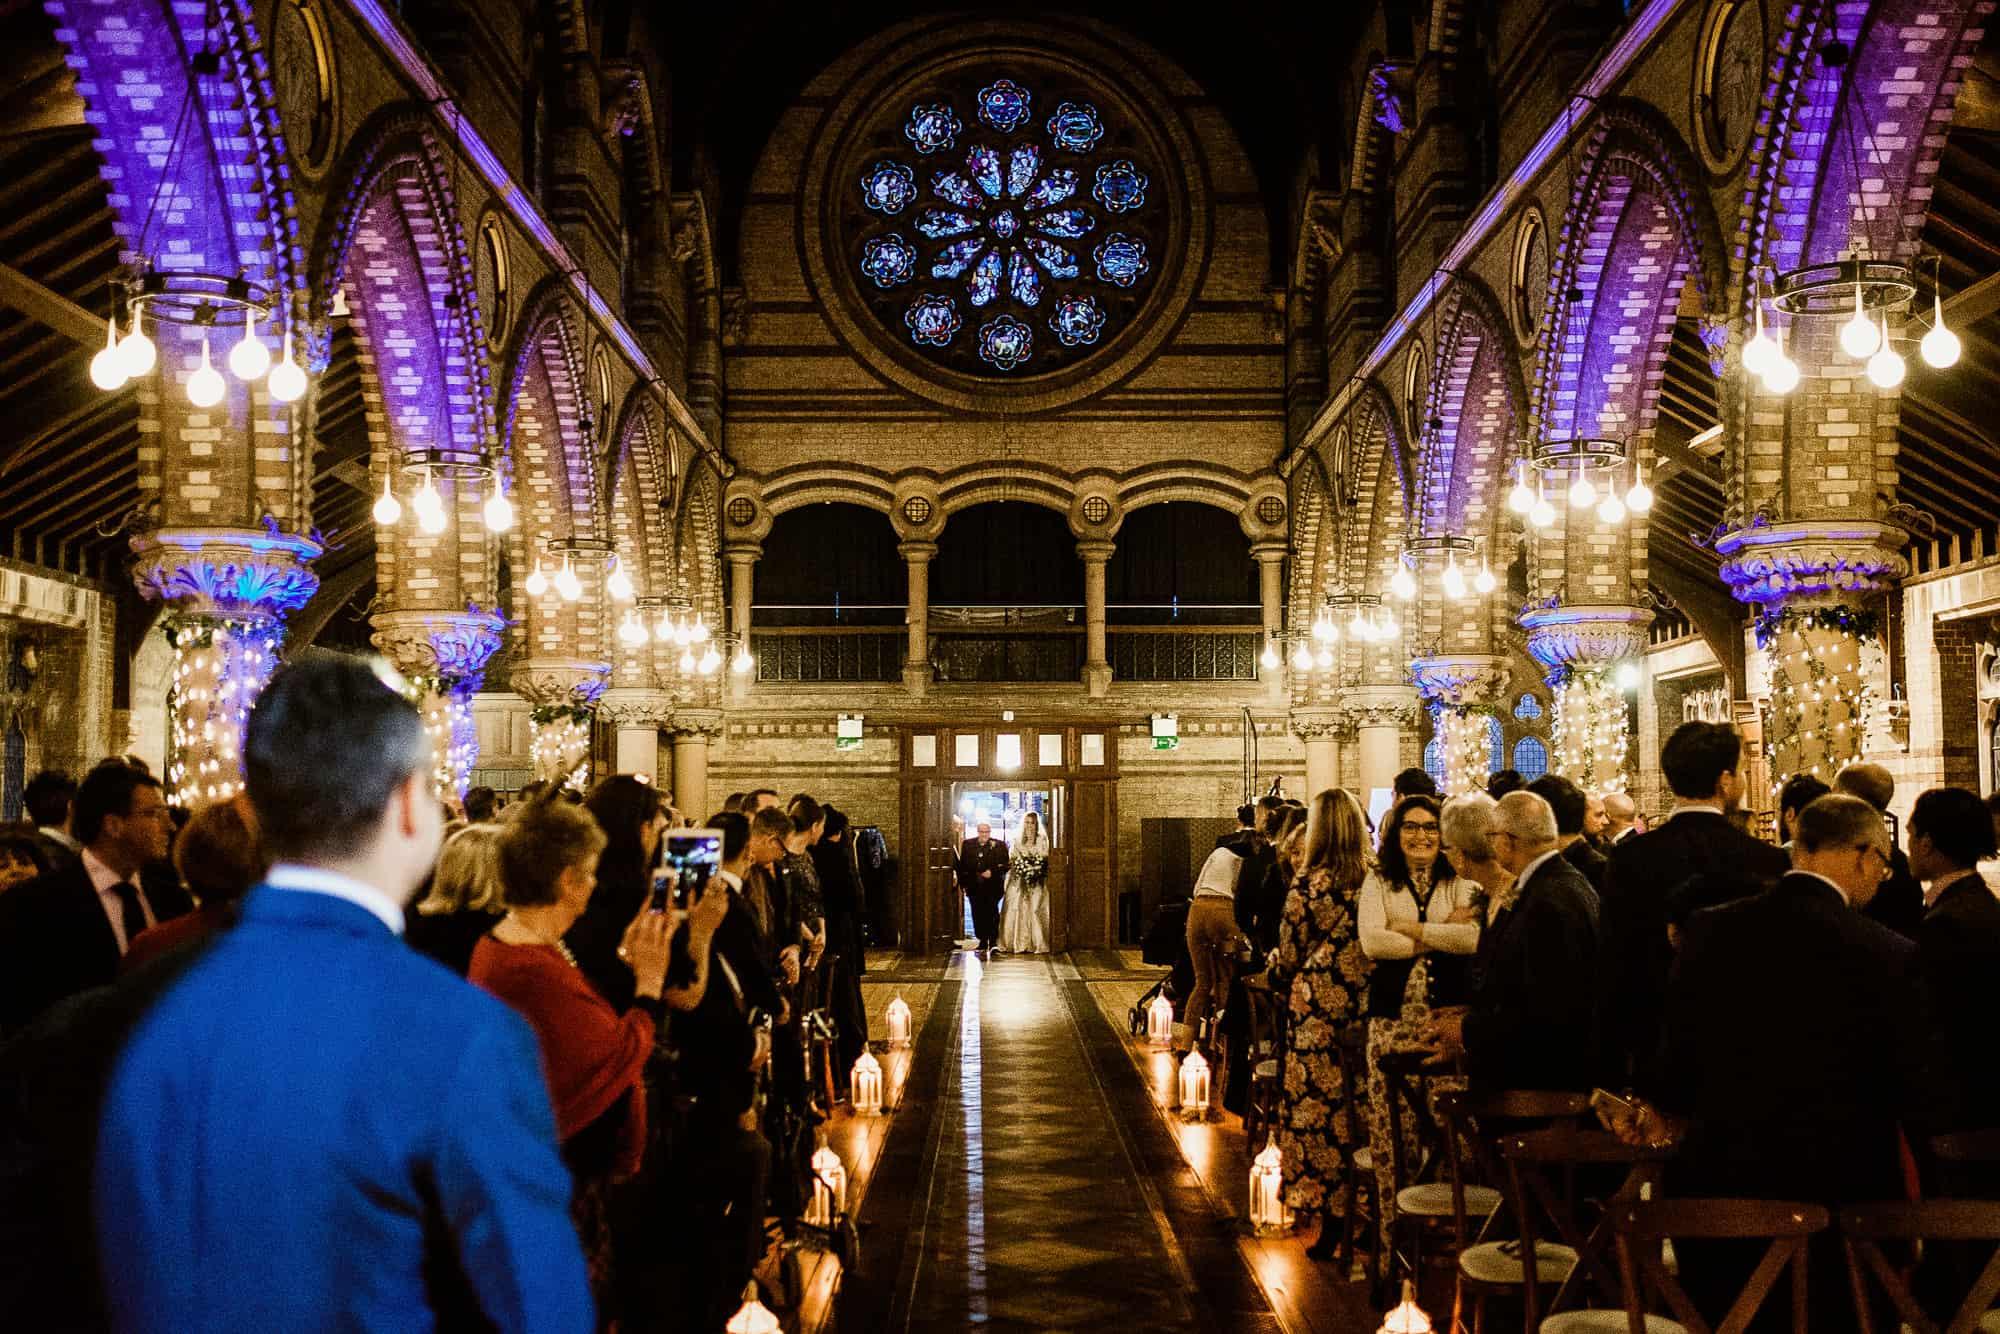 st-stephens-wedding-photographer-matt-tyler-0024